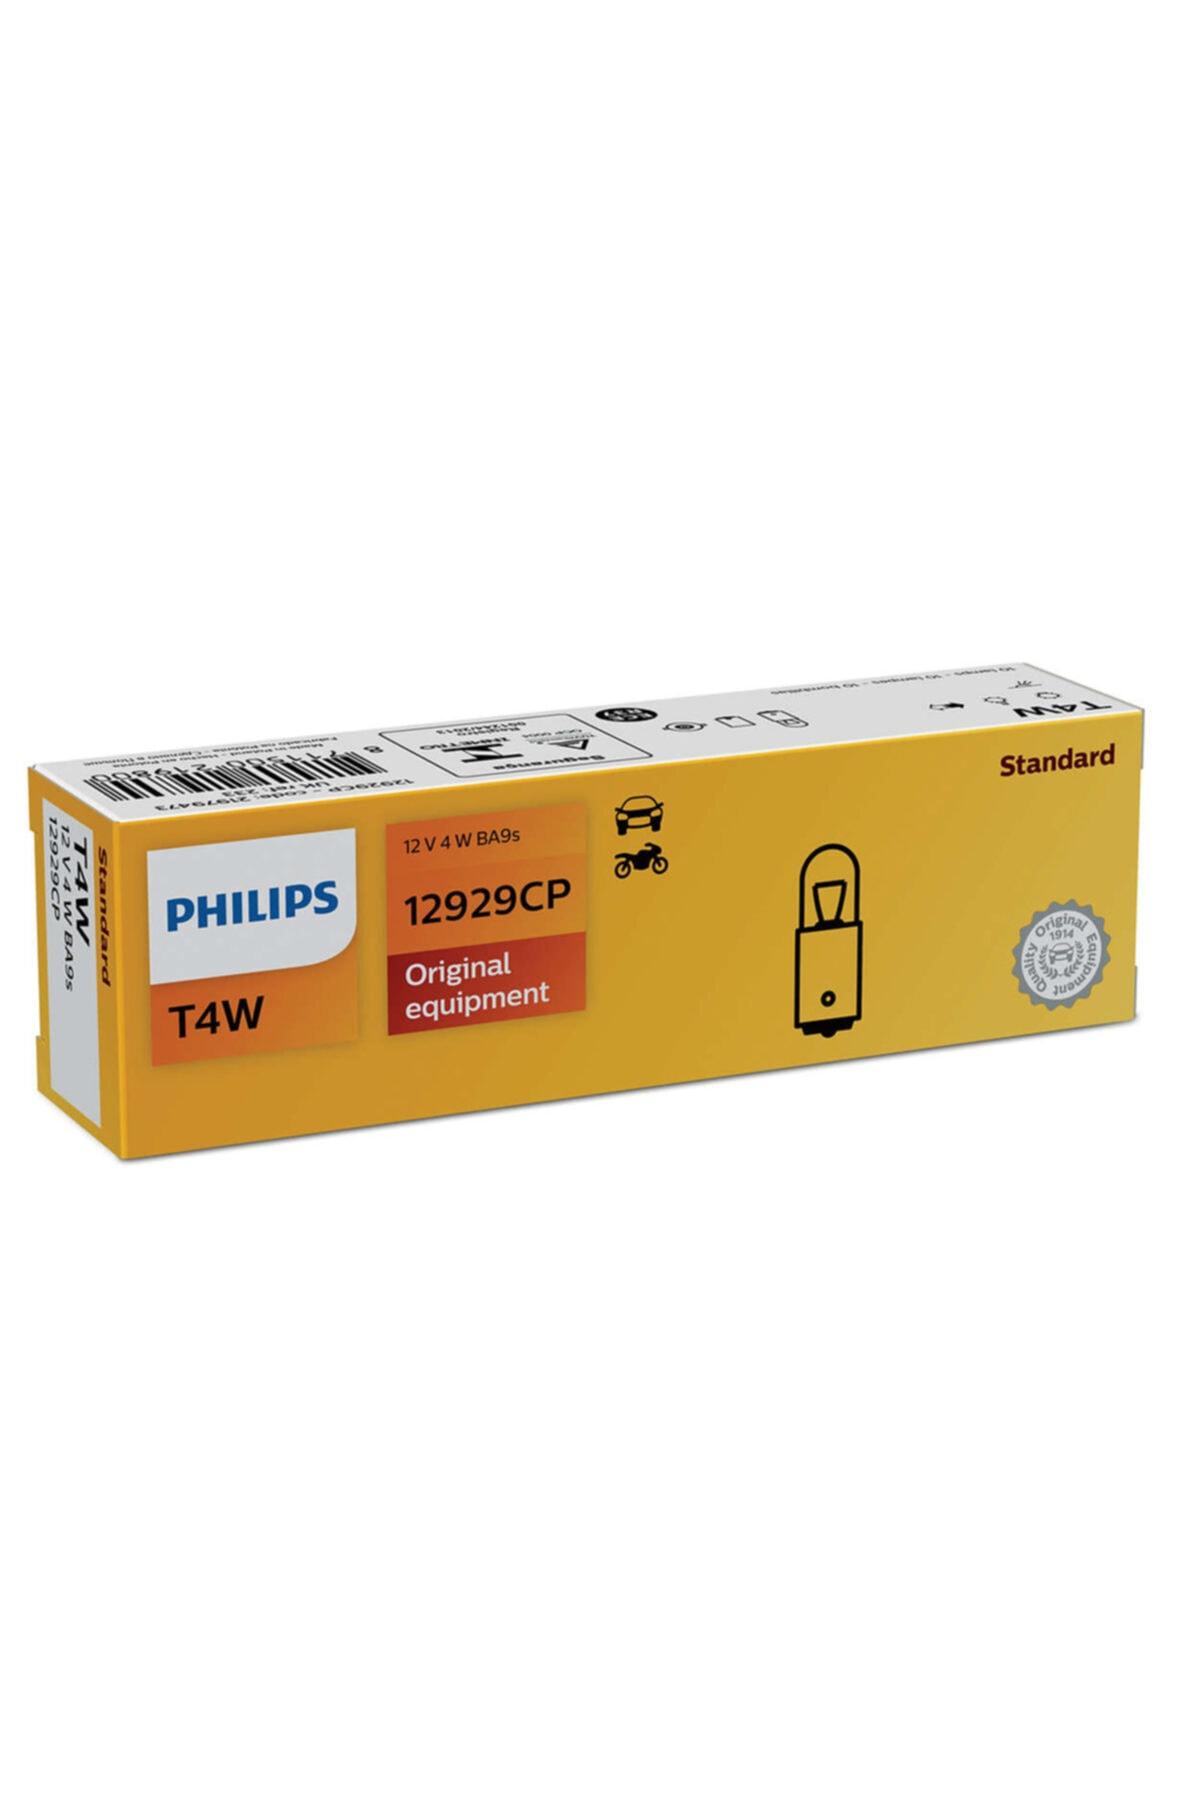 Philips Stop Sinyal Ampulü Ampul 53 12v 4w 12929cp - 10 Adet 1